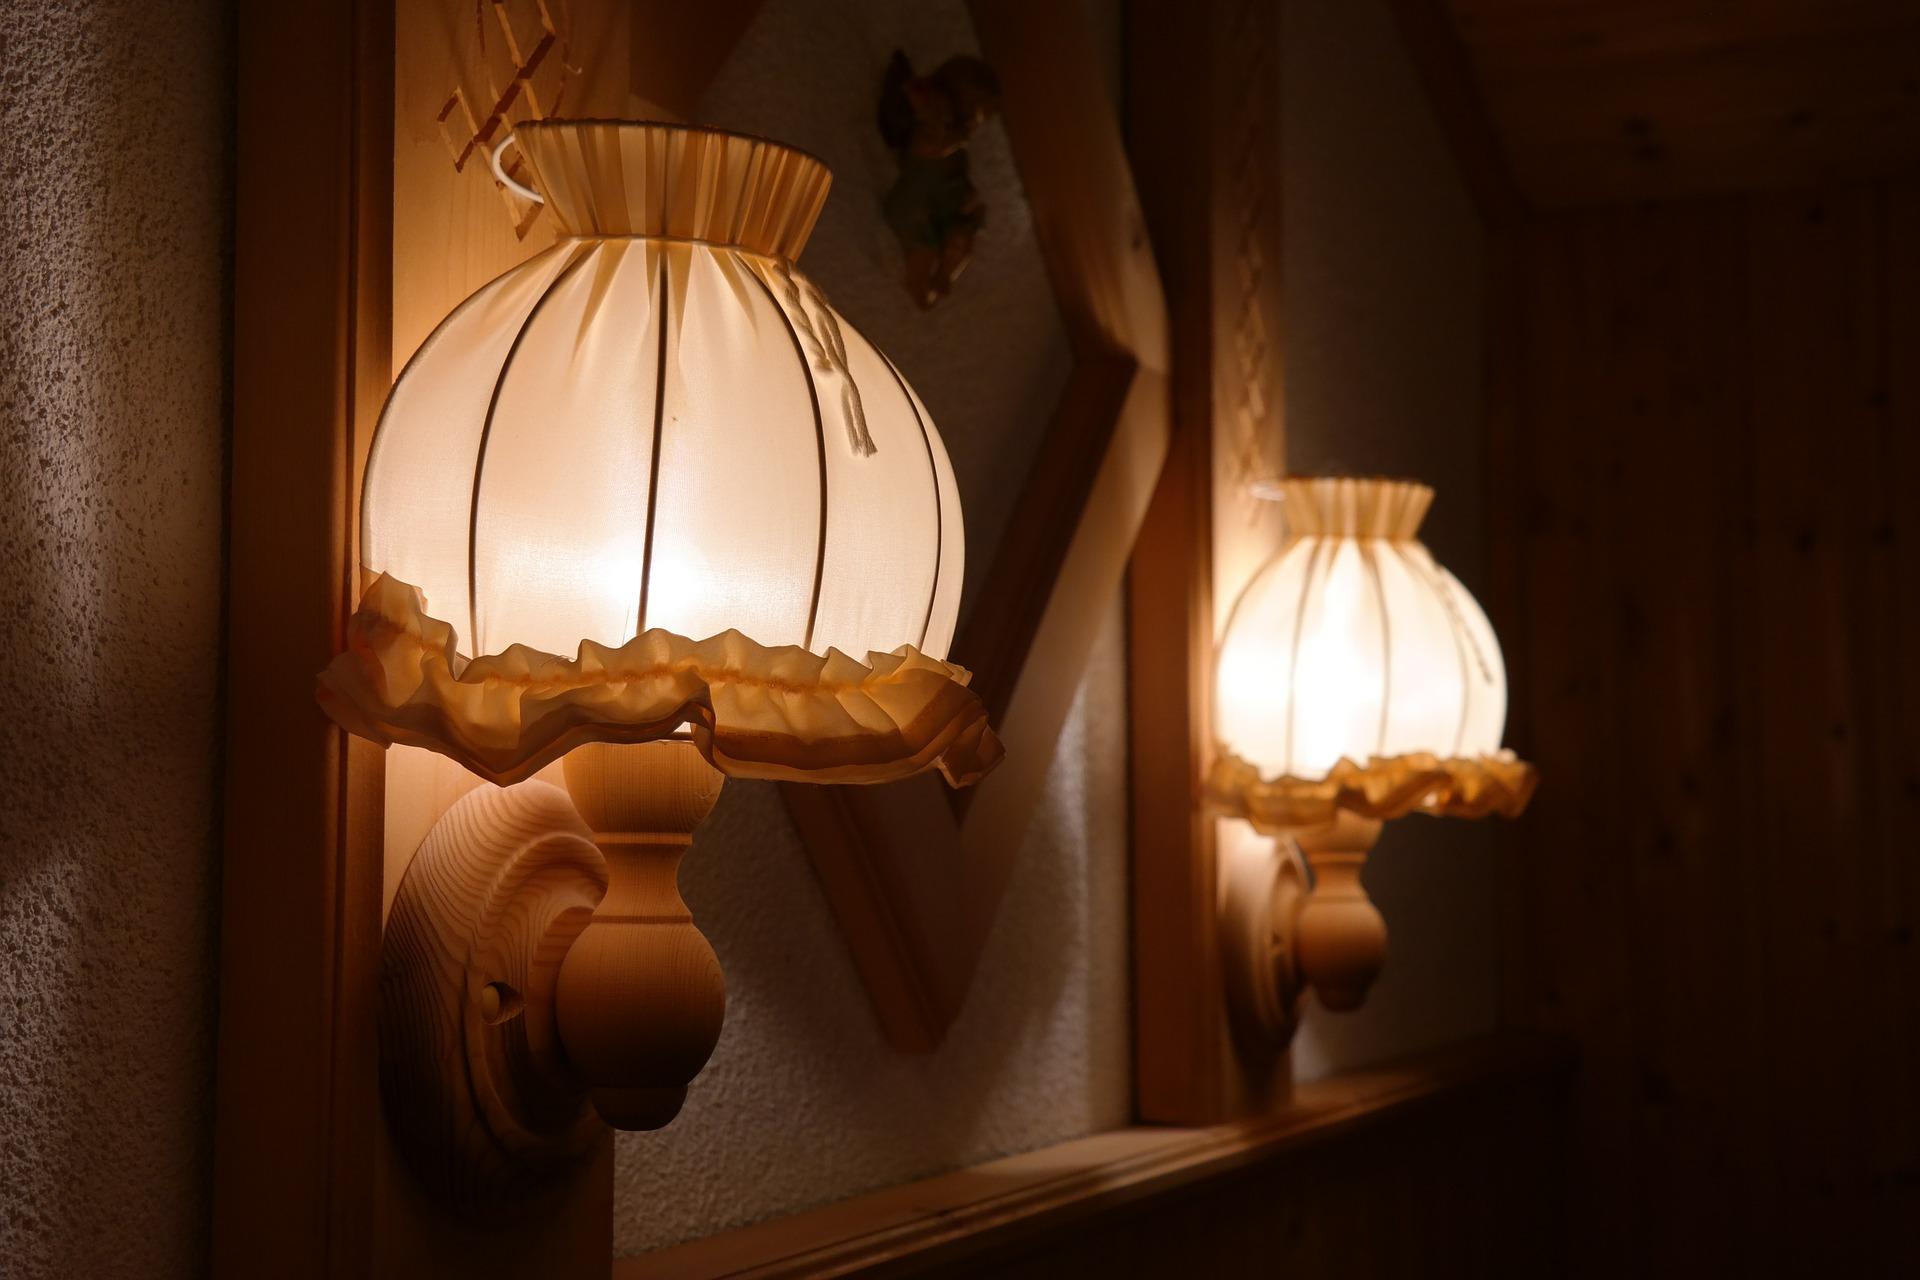 床頭燈壁燈式